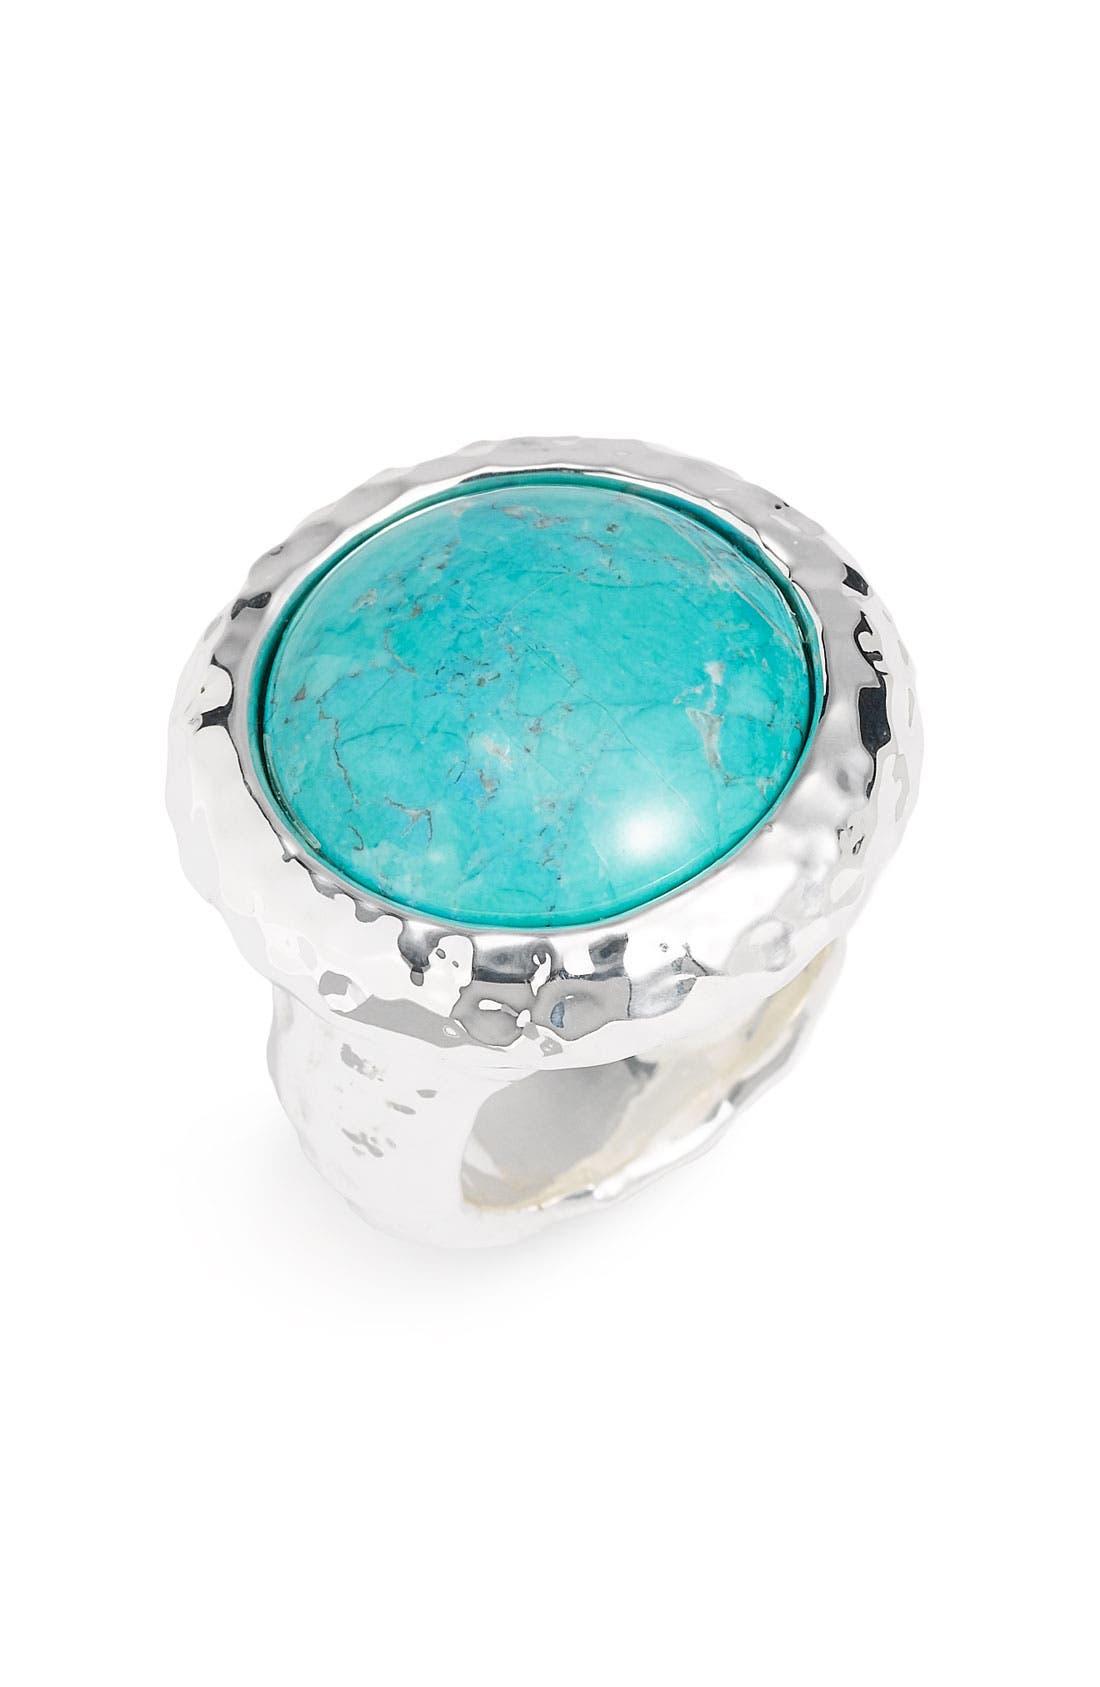 Main Image - Simon Sebbag Hammered Round Stone Ring